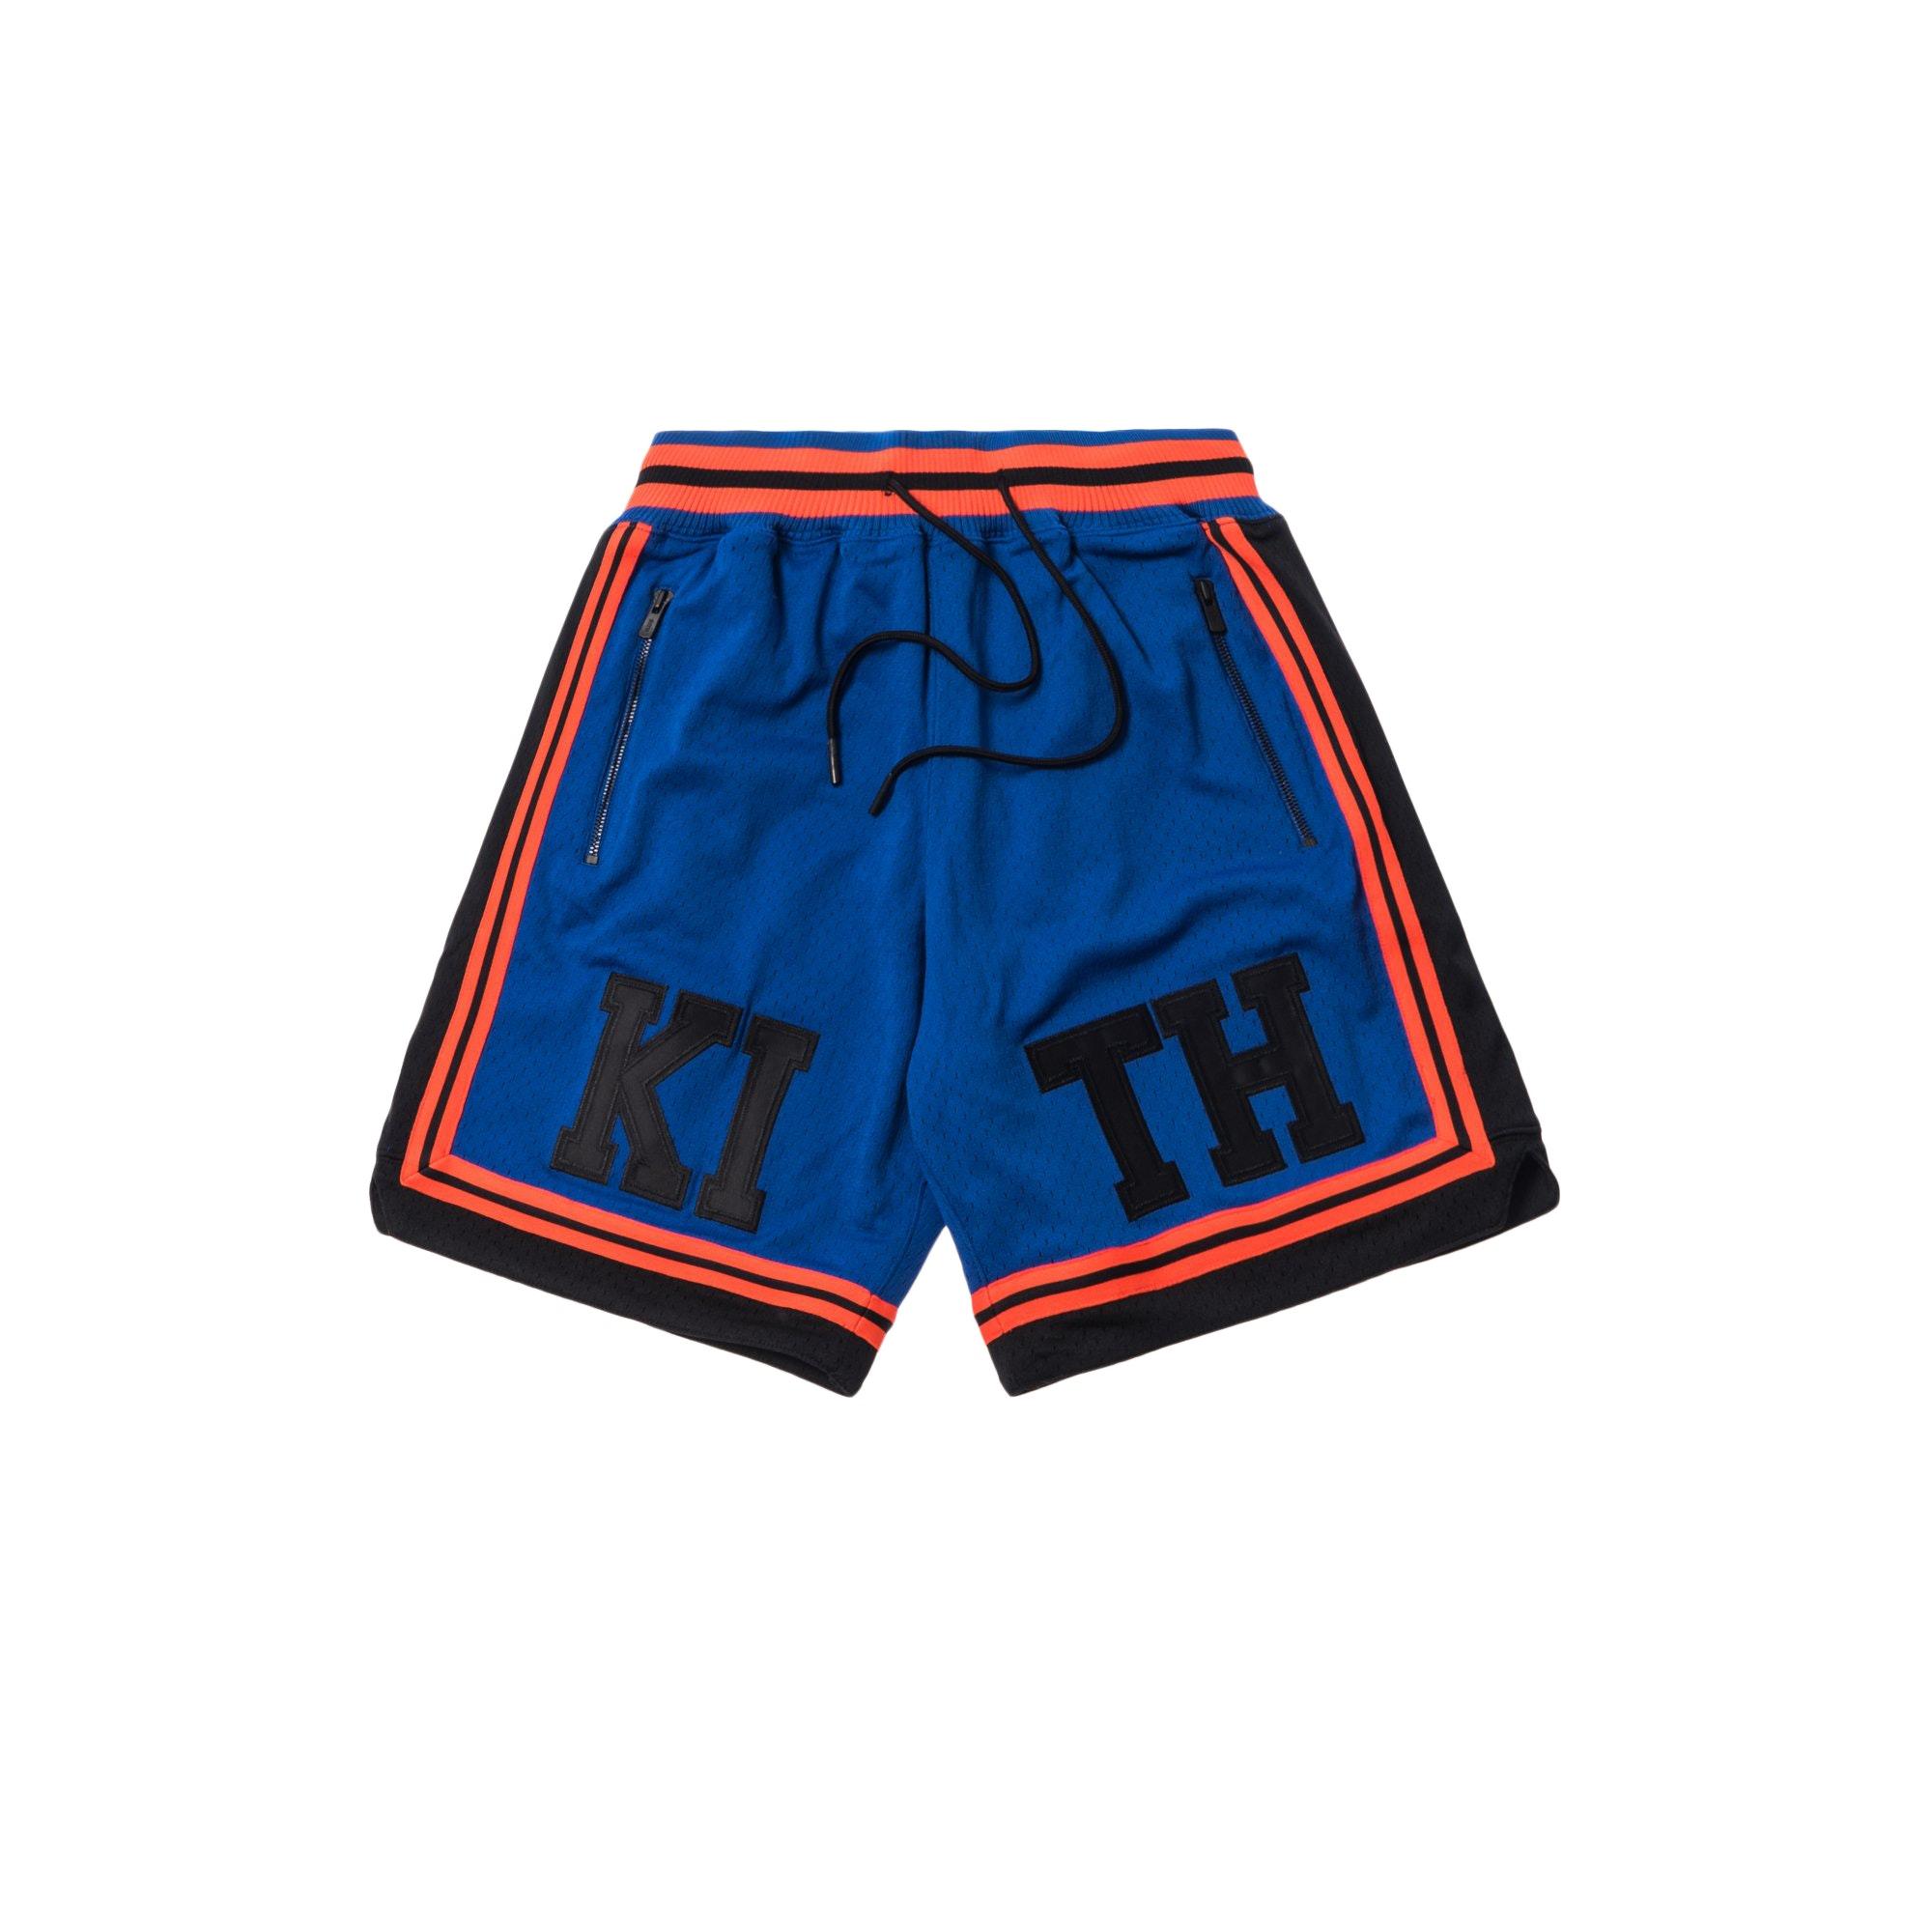 Kith x Mitchell & Ness Basketball Short New York